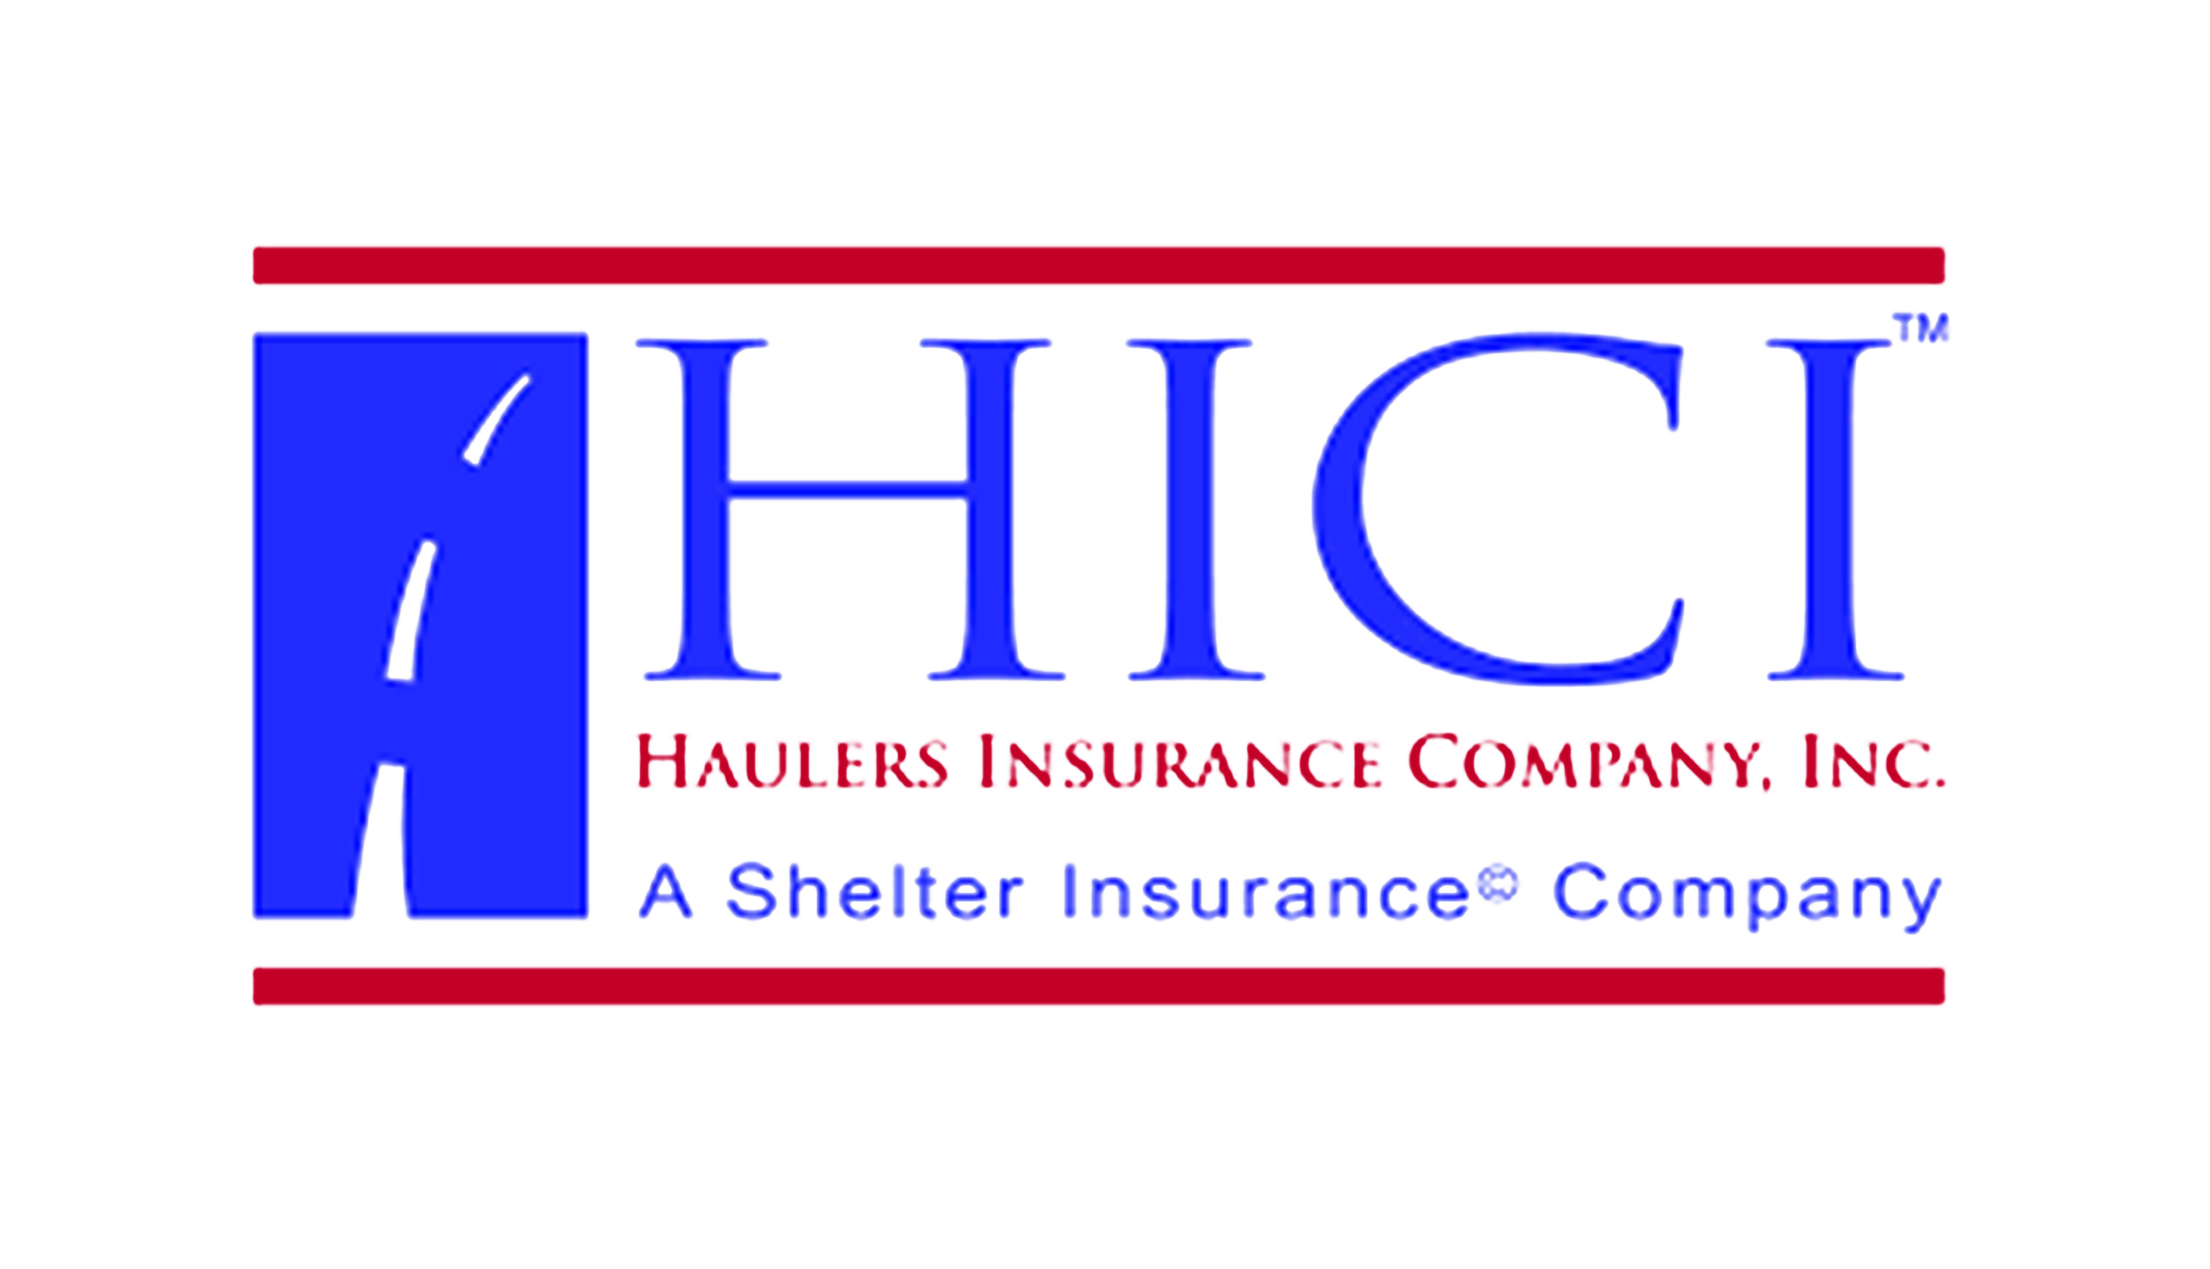 Haulers Insurance Co.